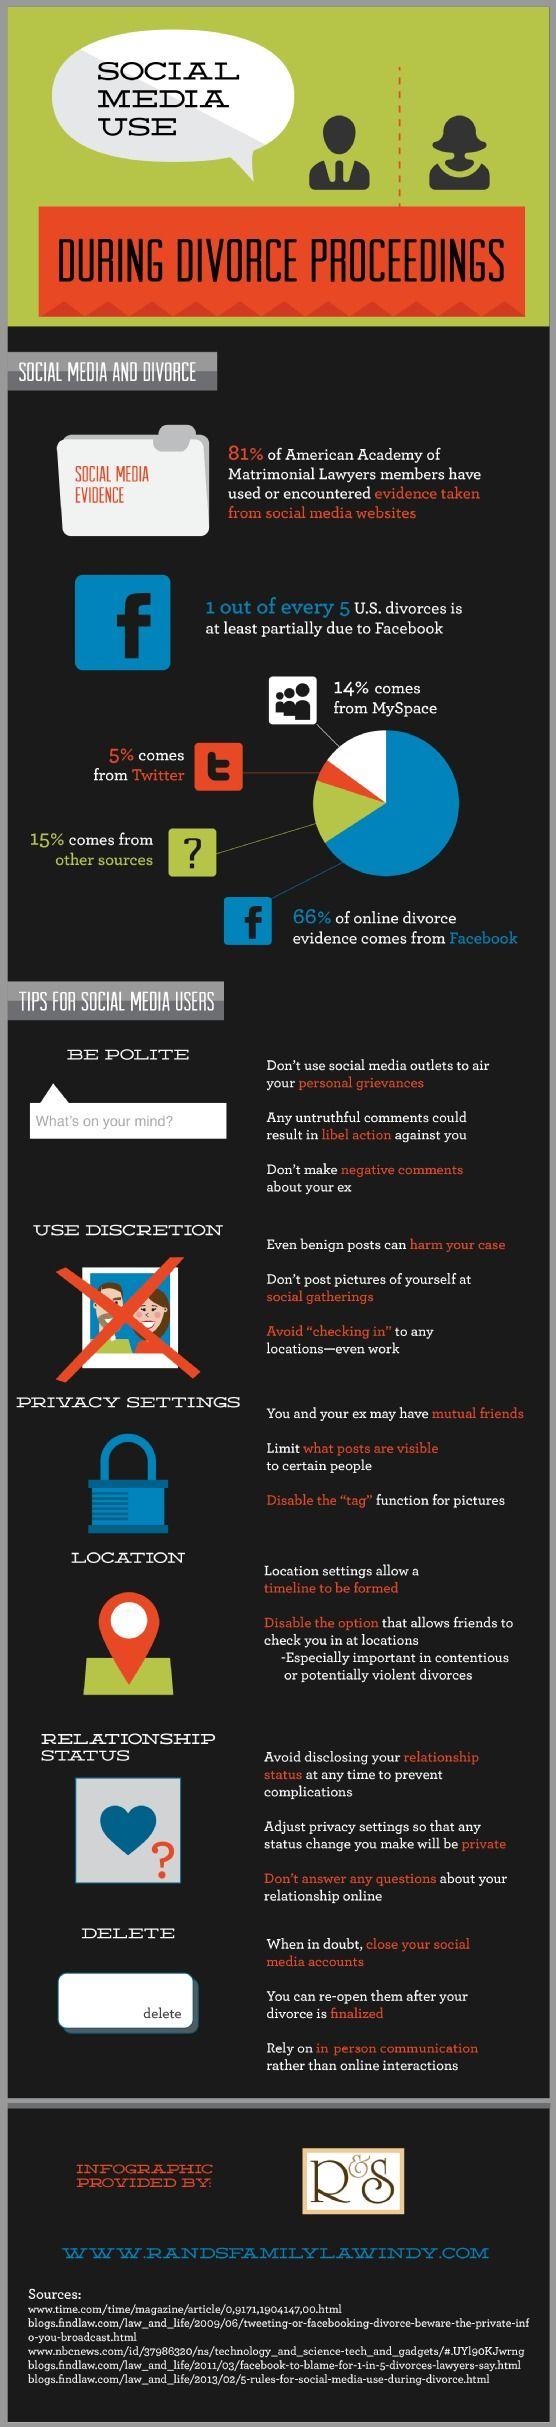 Social Media Use During Divorce Proceedings [Infographic] | By: Rubbert & Schaefer (Via: ScoopIt) | #socialmedia #divorce #infographic